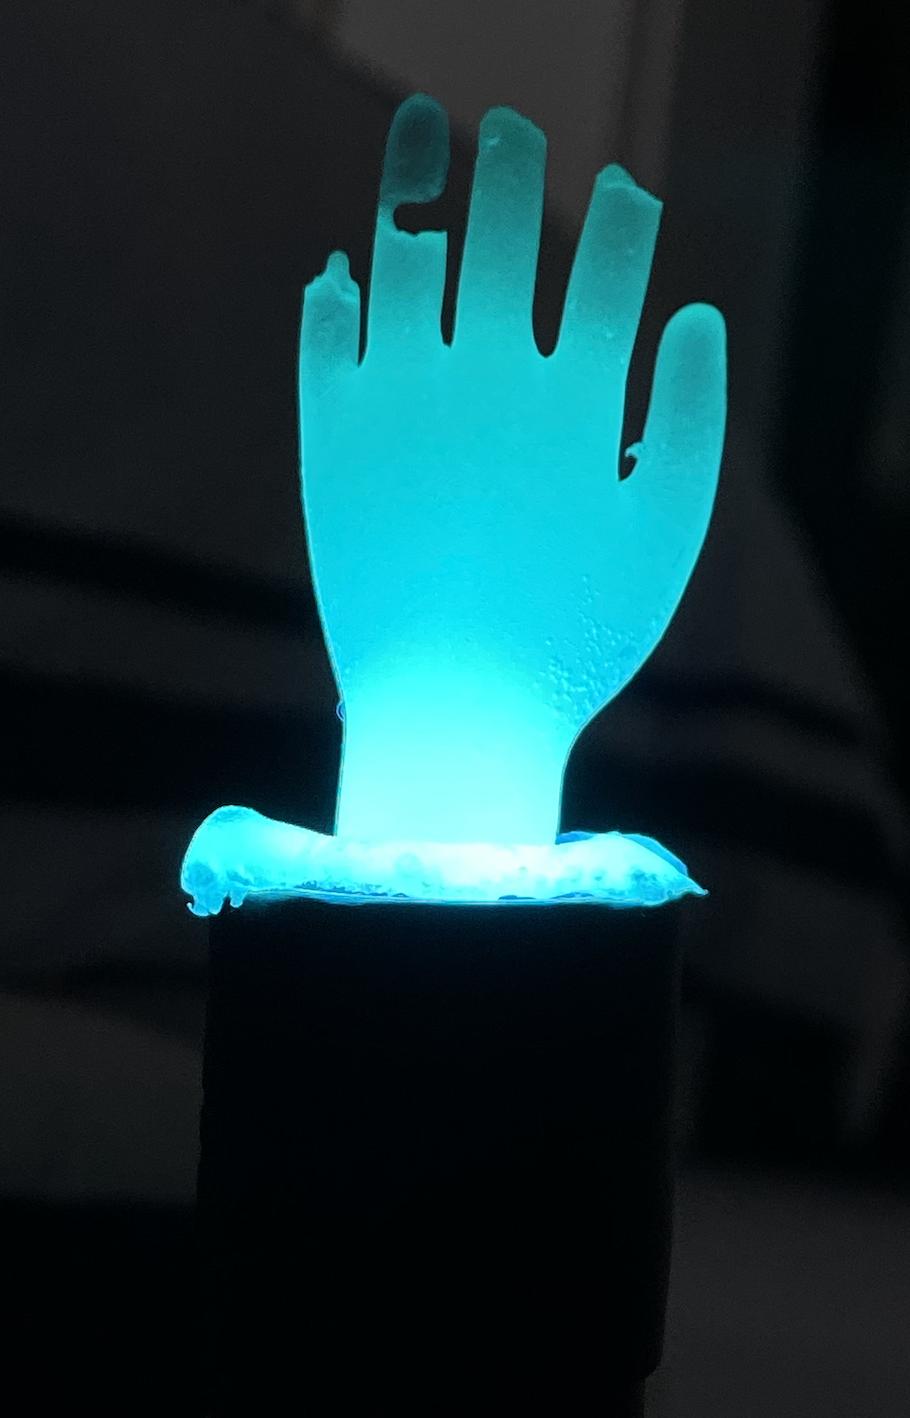 Fluorescent epoxy hand lit by UV light.